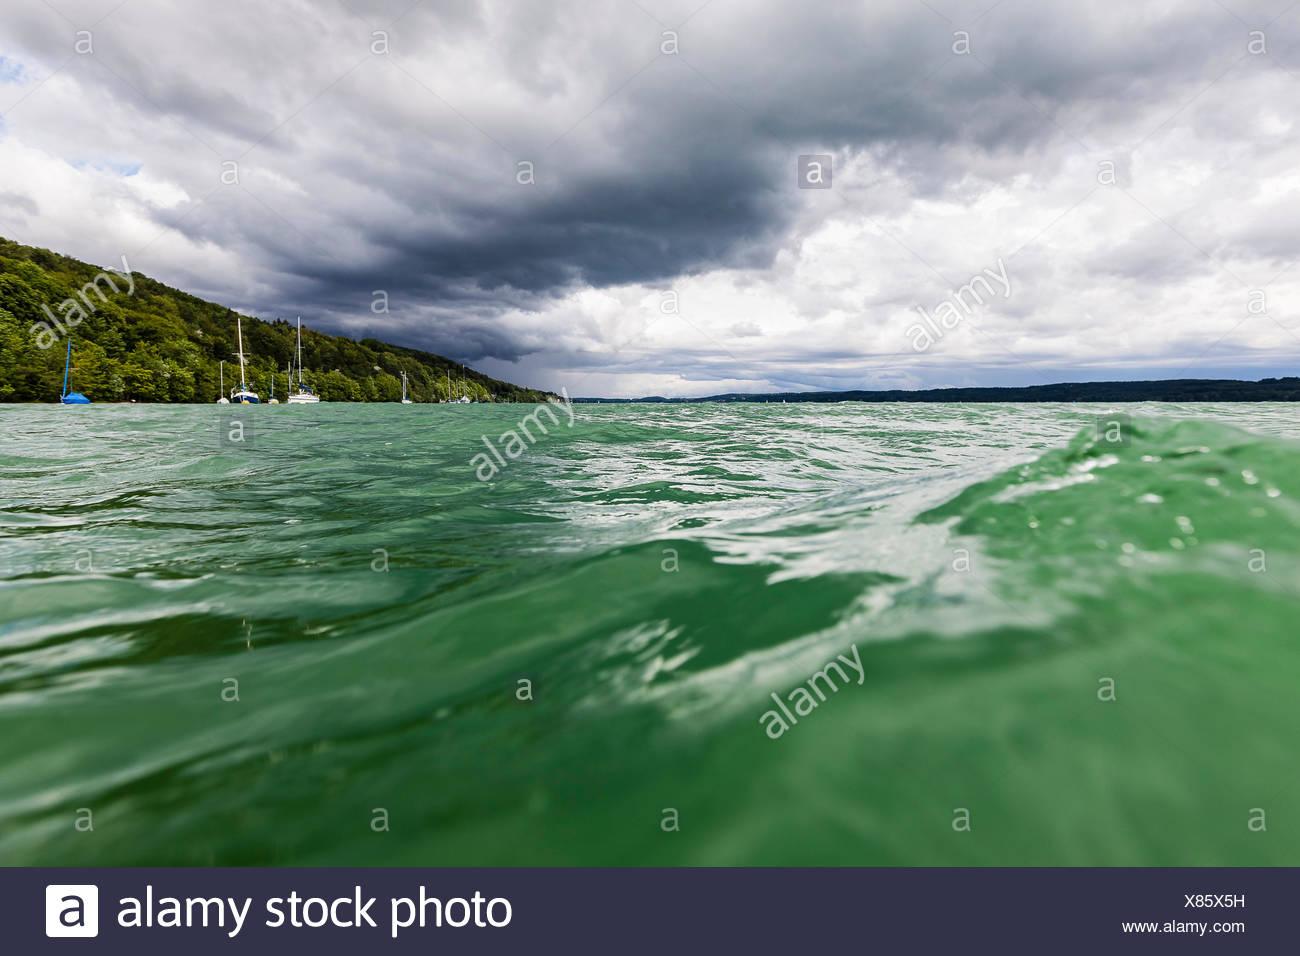 Cloud cover above Lake Starnberg, Upper Bavaria, Germany - Stock Image